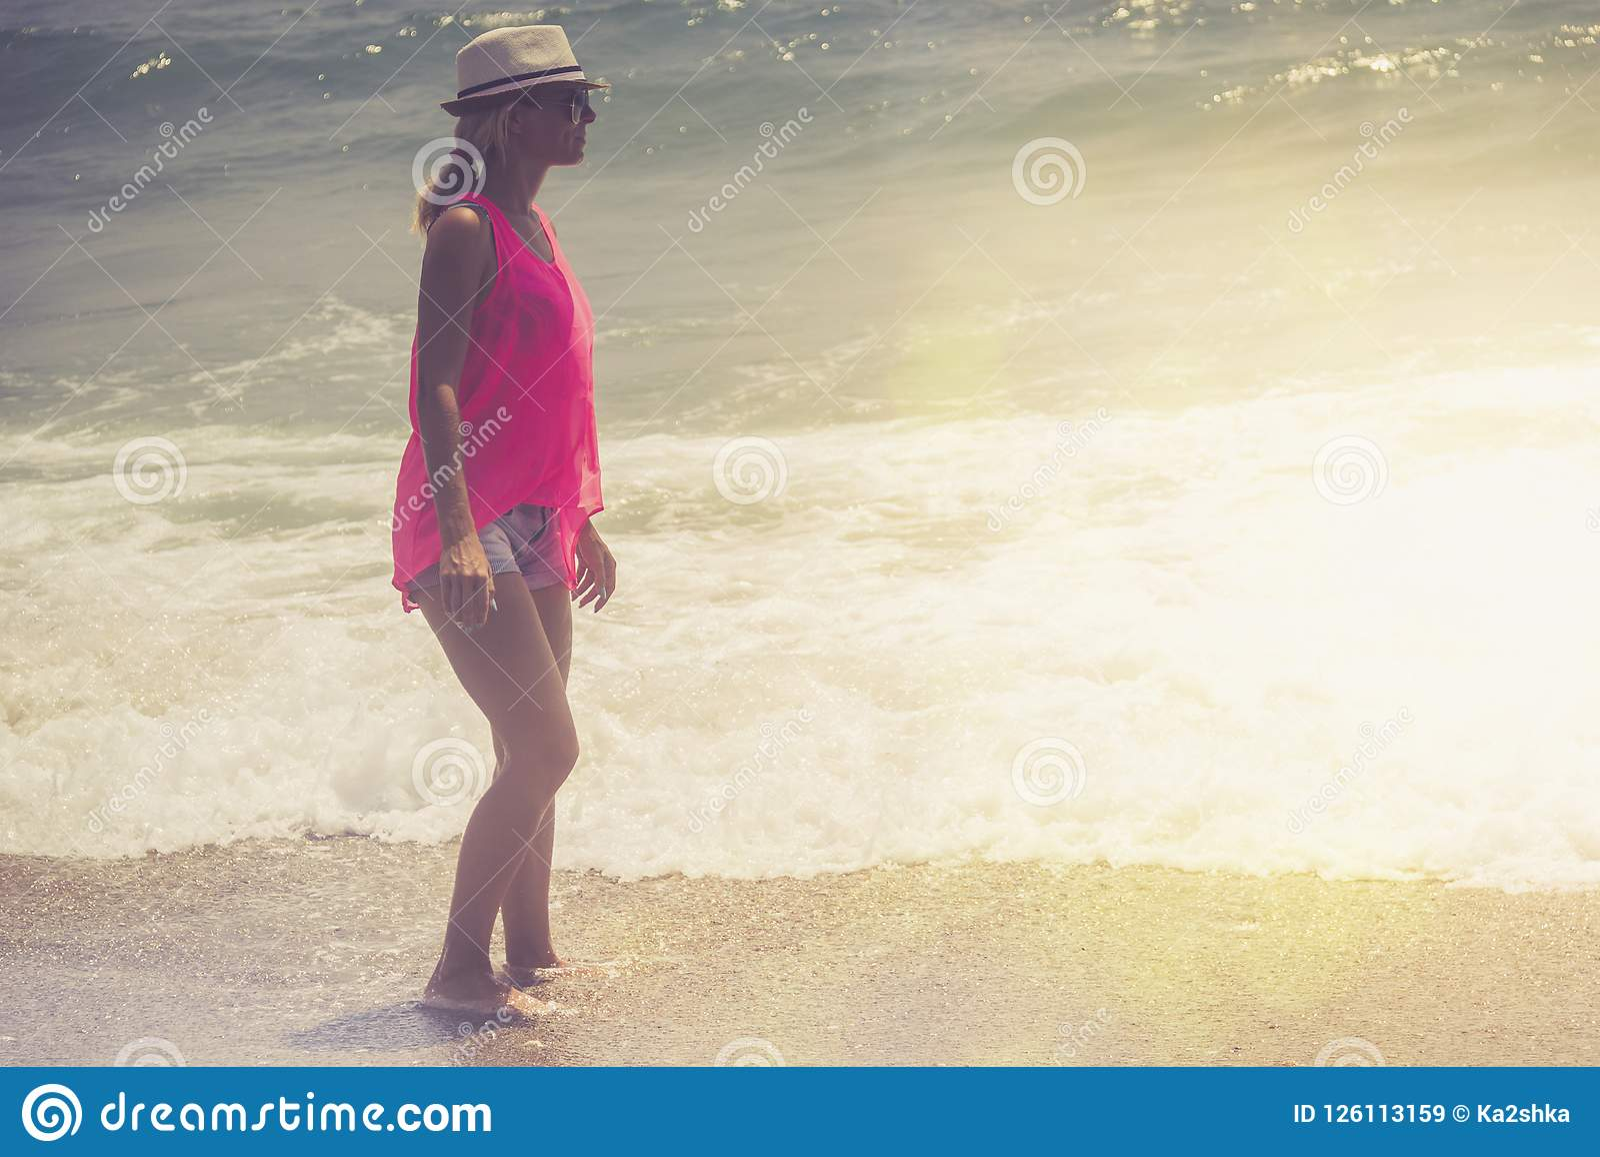 Beautiful woman walking on the beach.Relaxed woman breathing fresh air,emotional sensual woman near the sea, enjoying summer.Trave